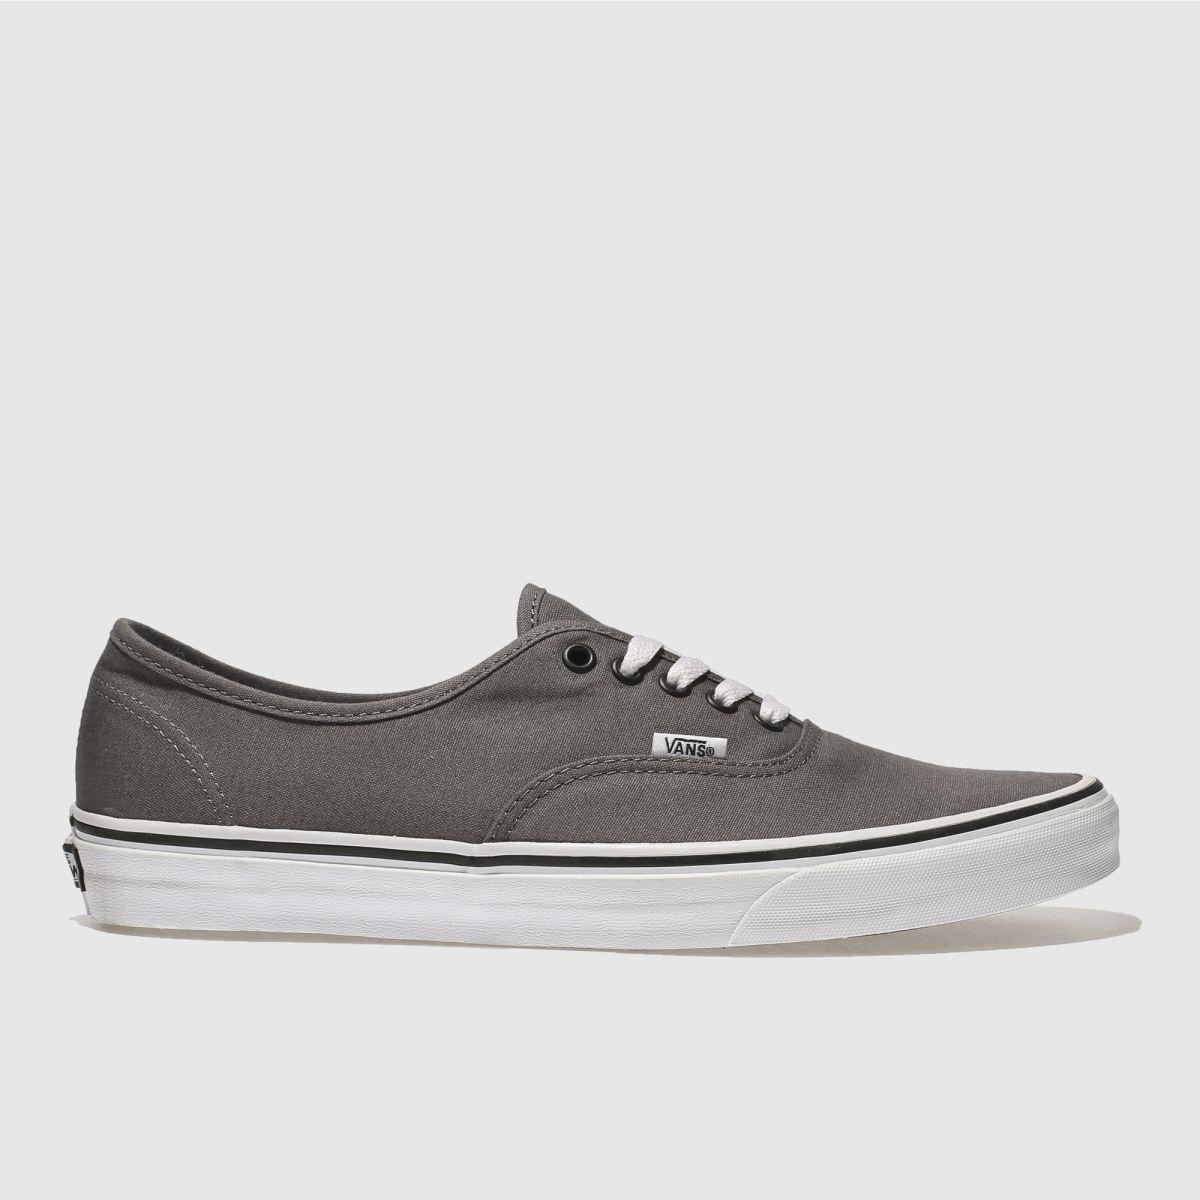 Vans Grey & Black Authentic Trainers